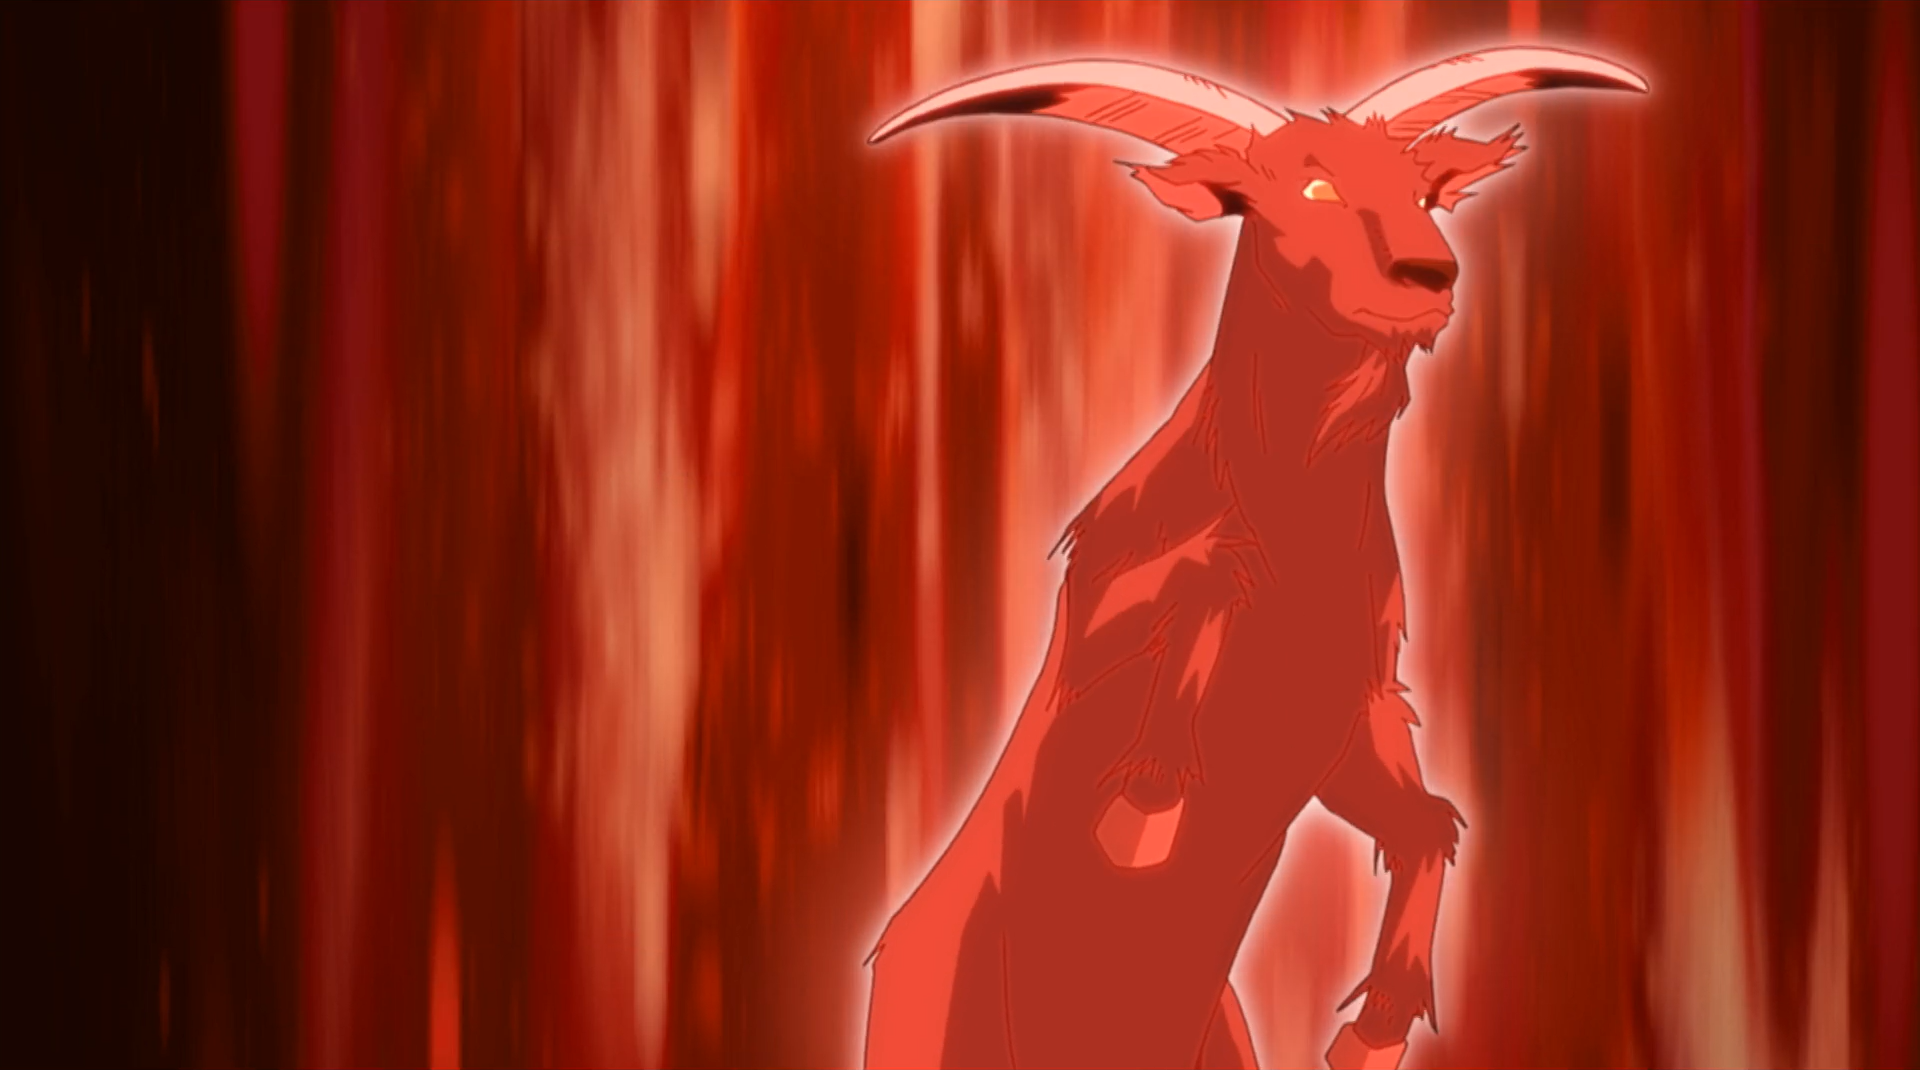 Datei:MFB Goat.png